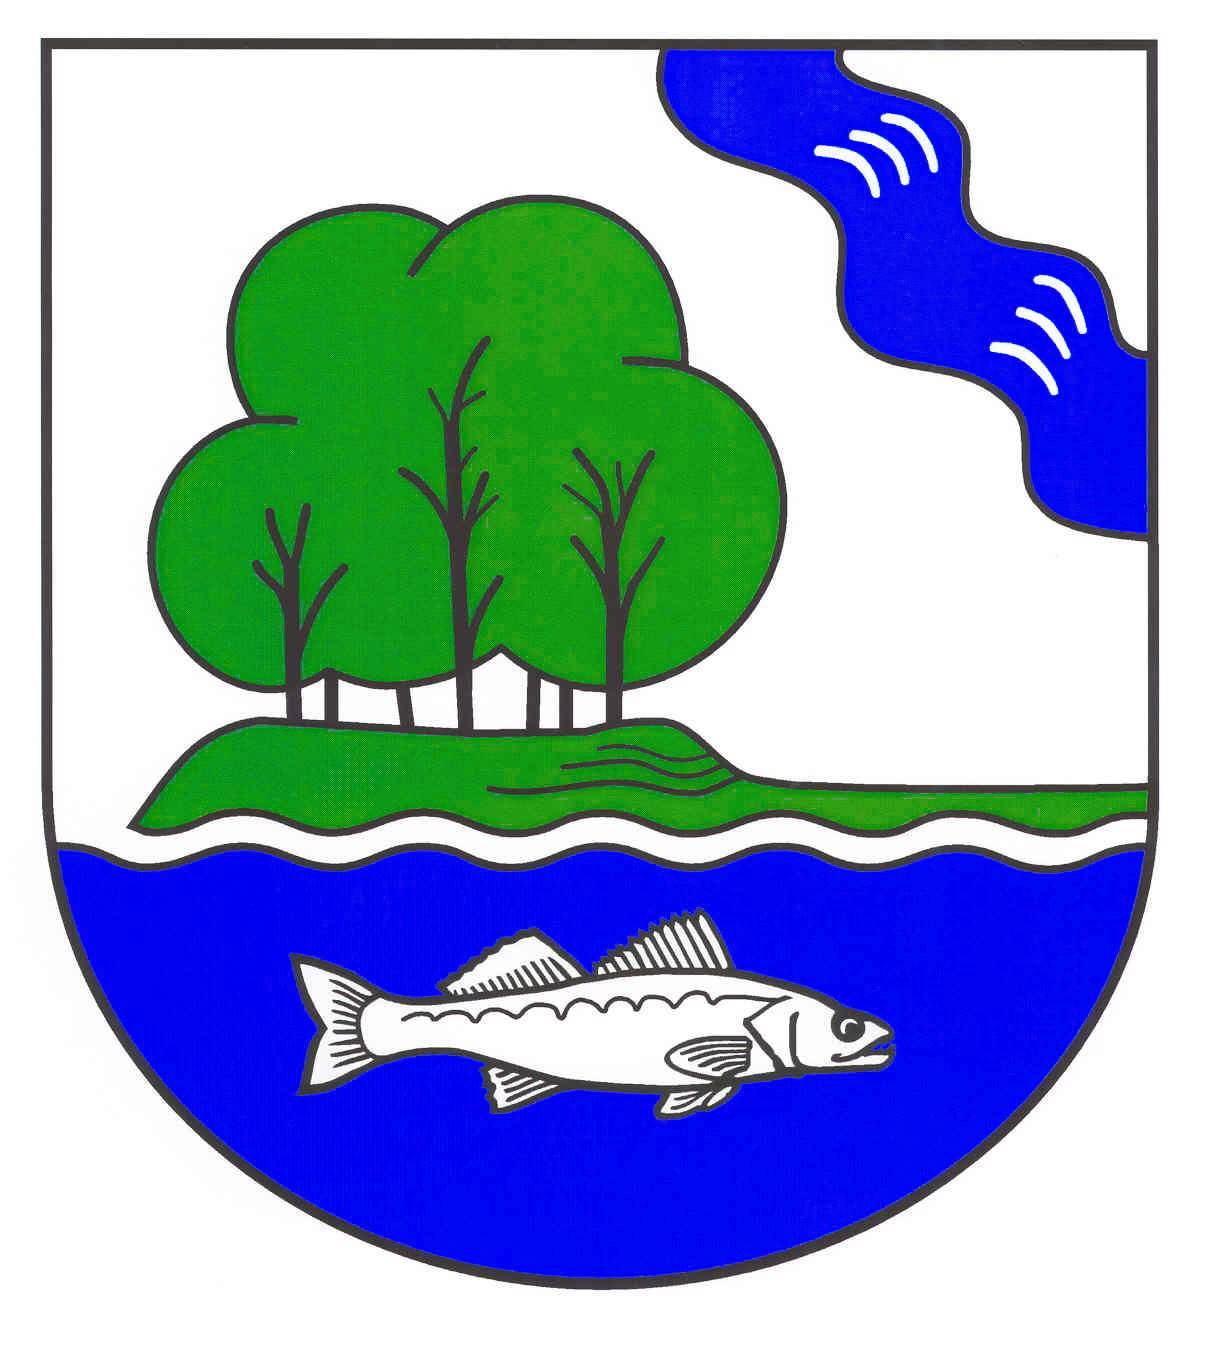 Wappen GemeindeNeversdorf, Kreis Segeberg